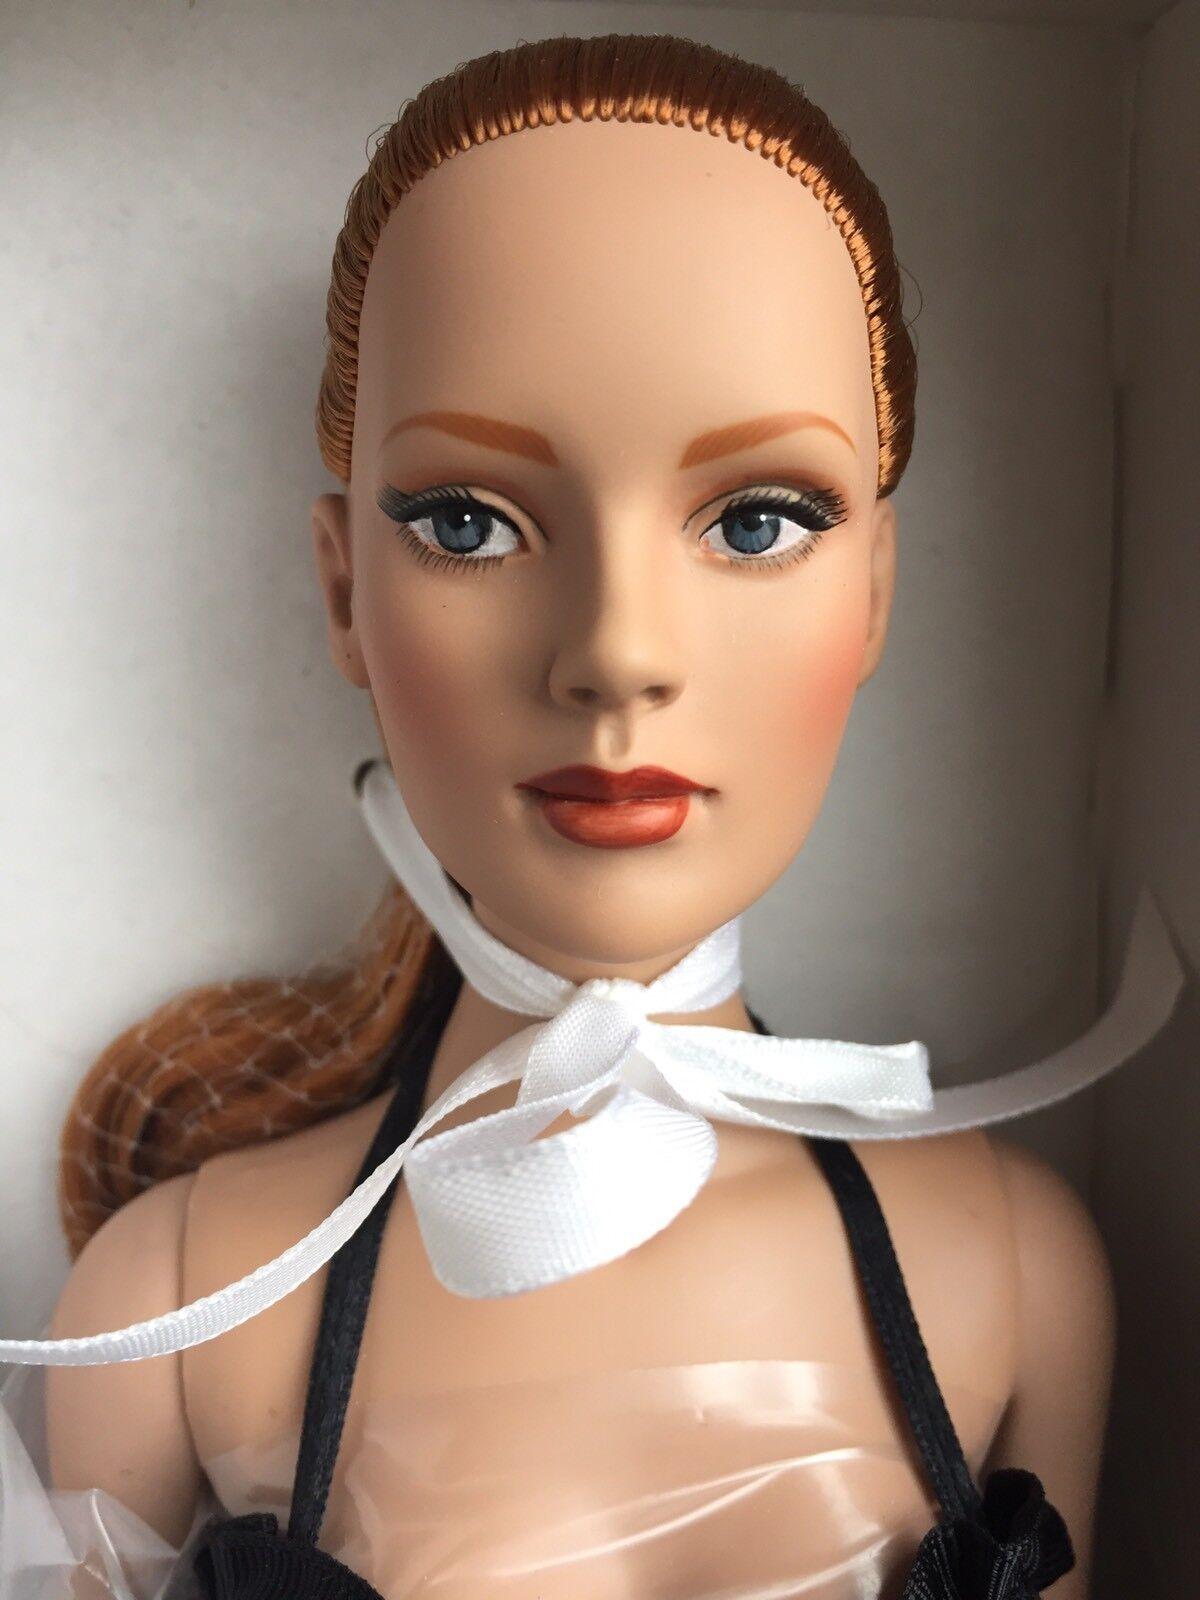 Tonner Tyler 40.6cm Cherished Friends Rtw Suzette Dubois rossohead Bambola Fashion